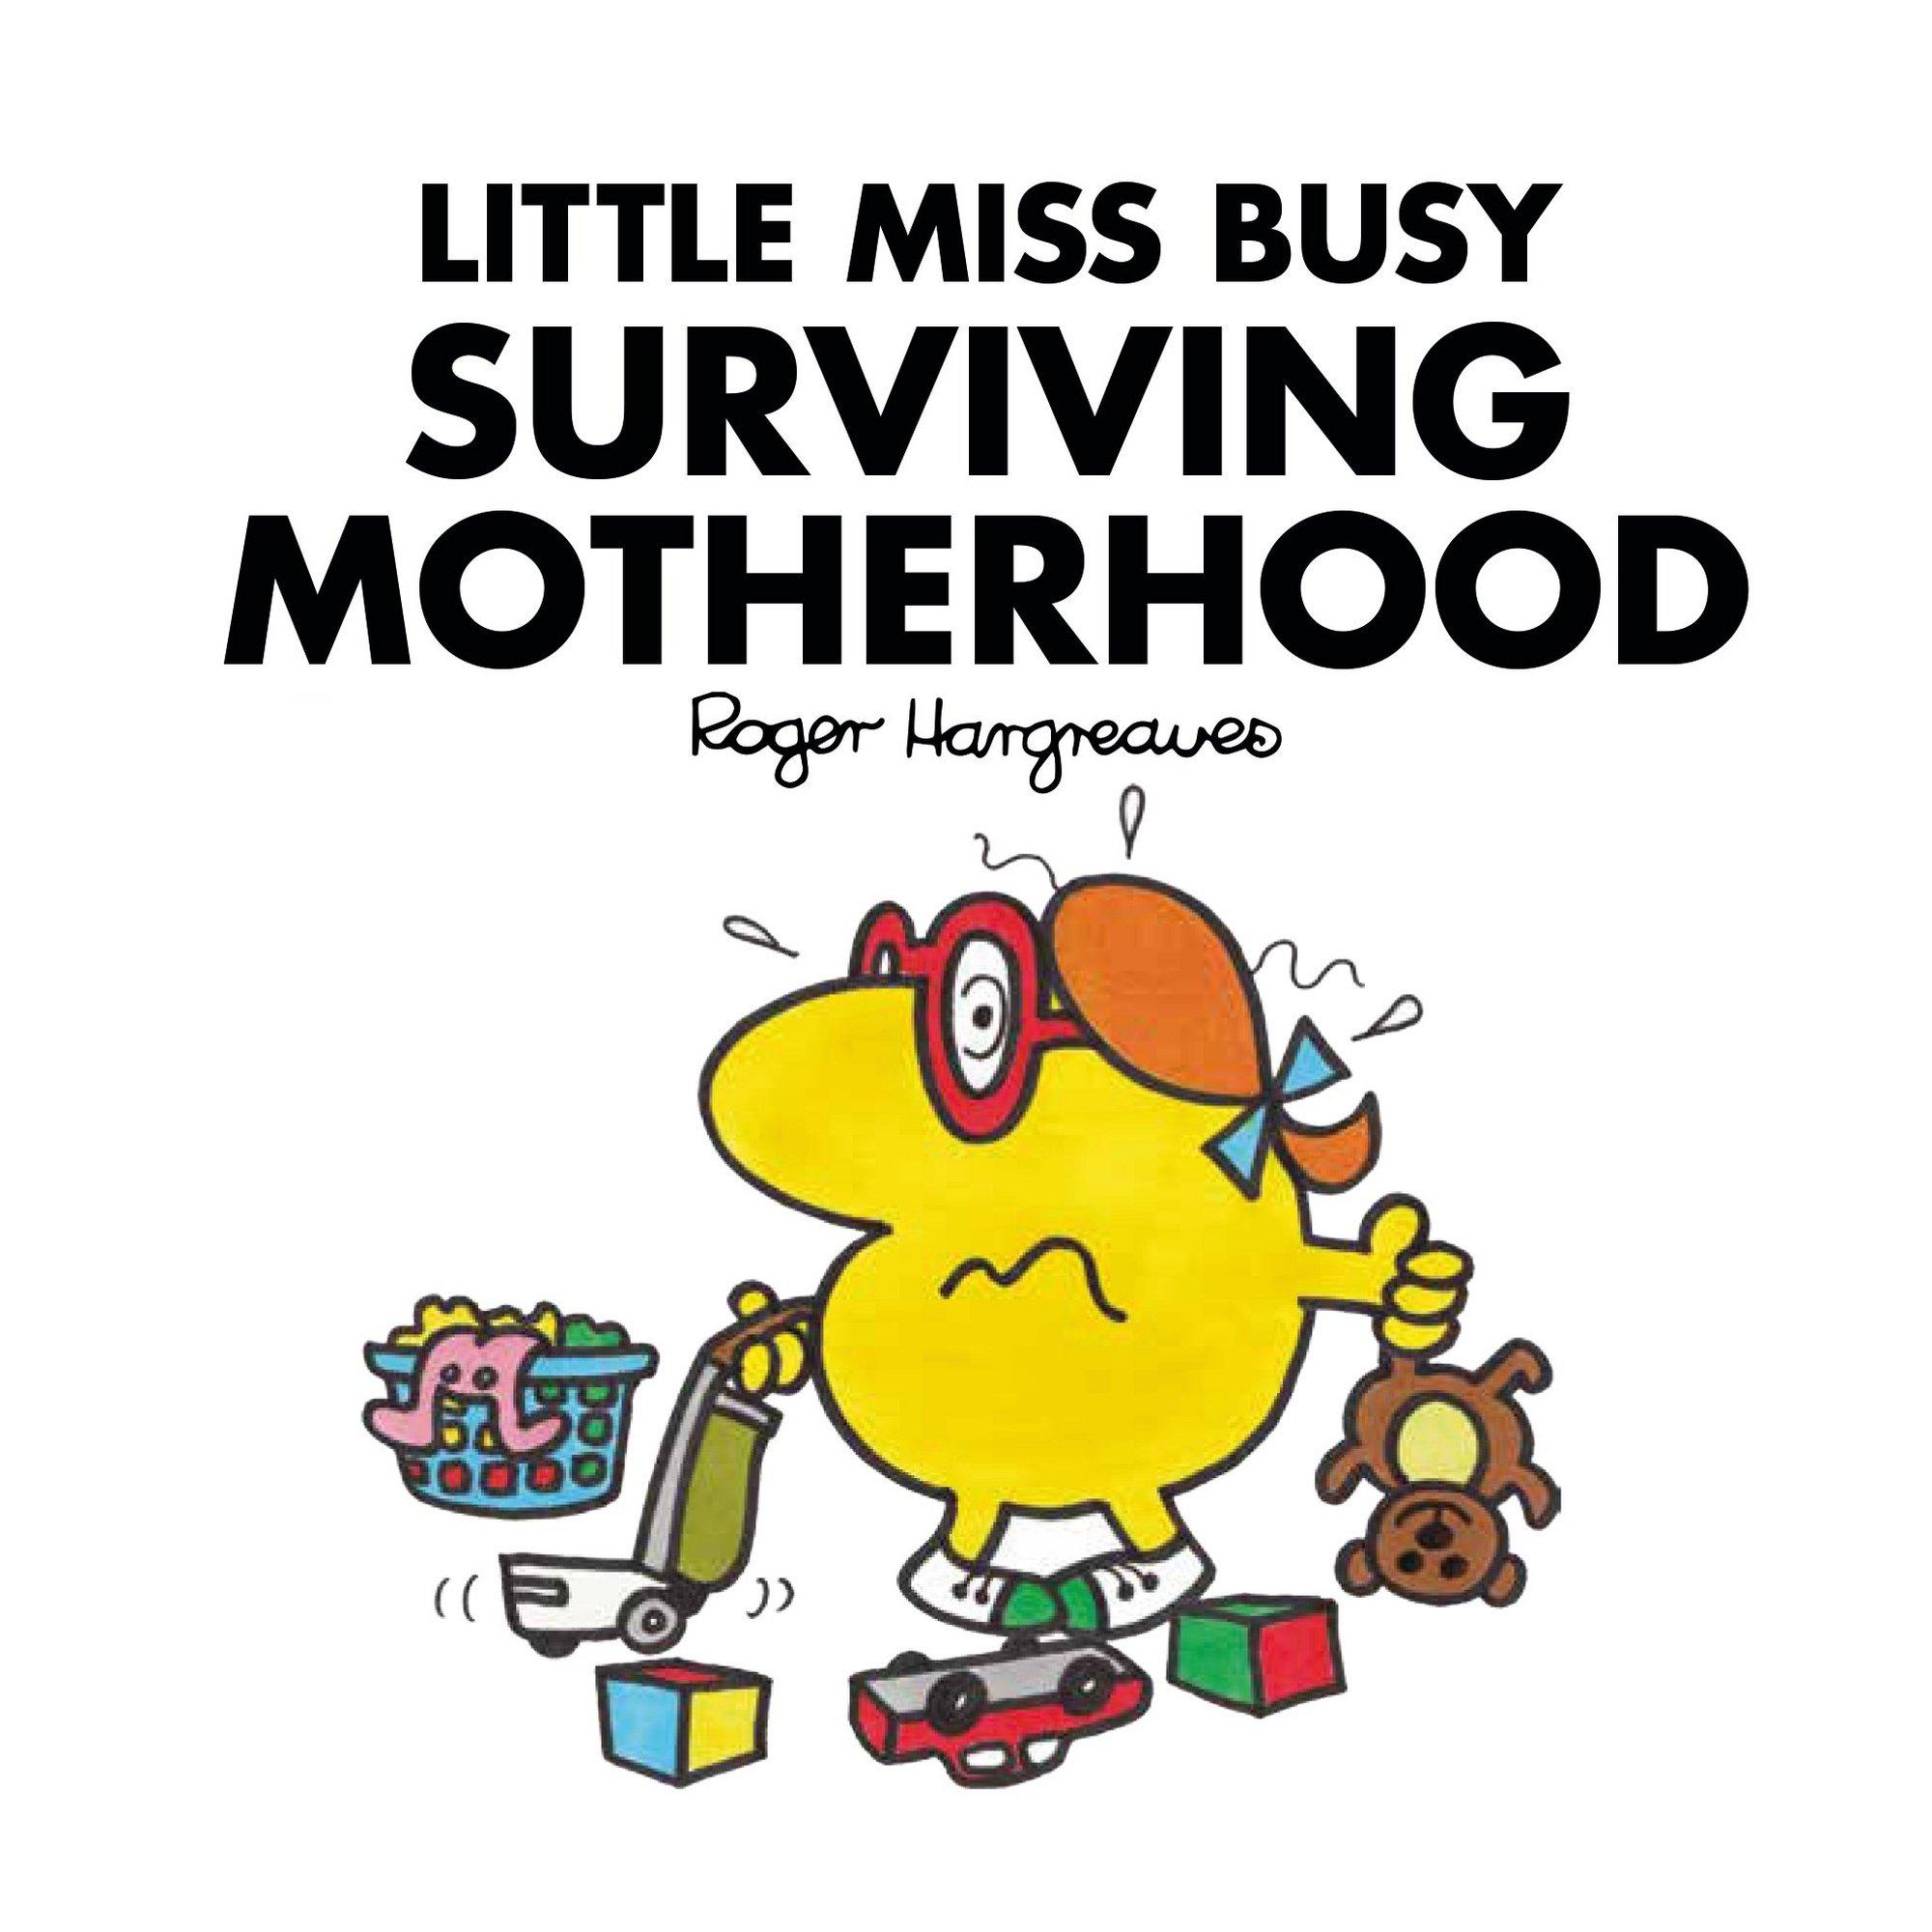 Image of Mr Men Book: Little Miss Busy Surviving Motherhood